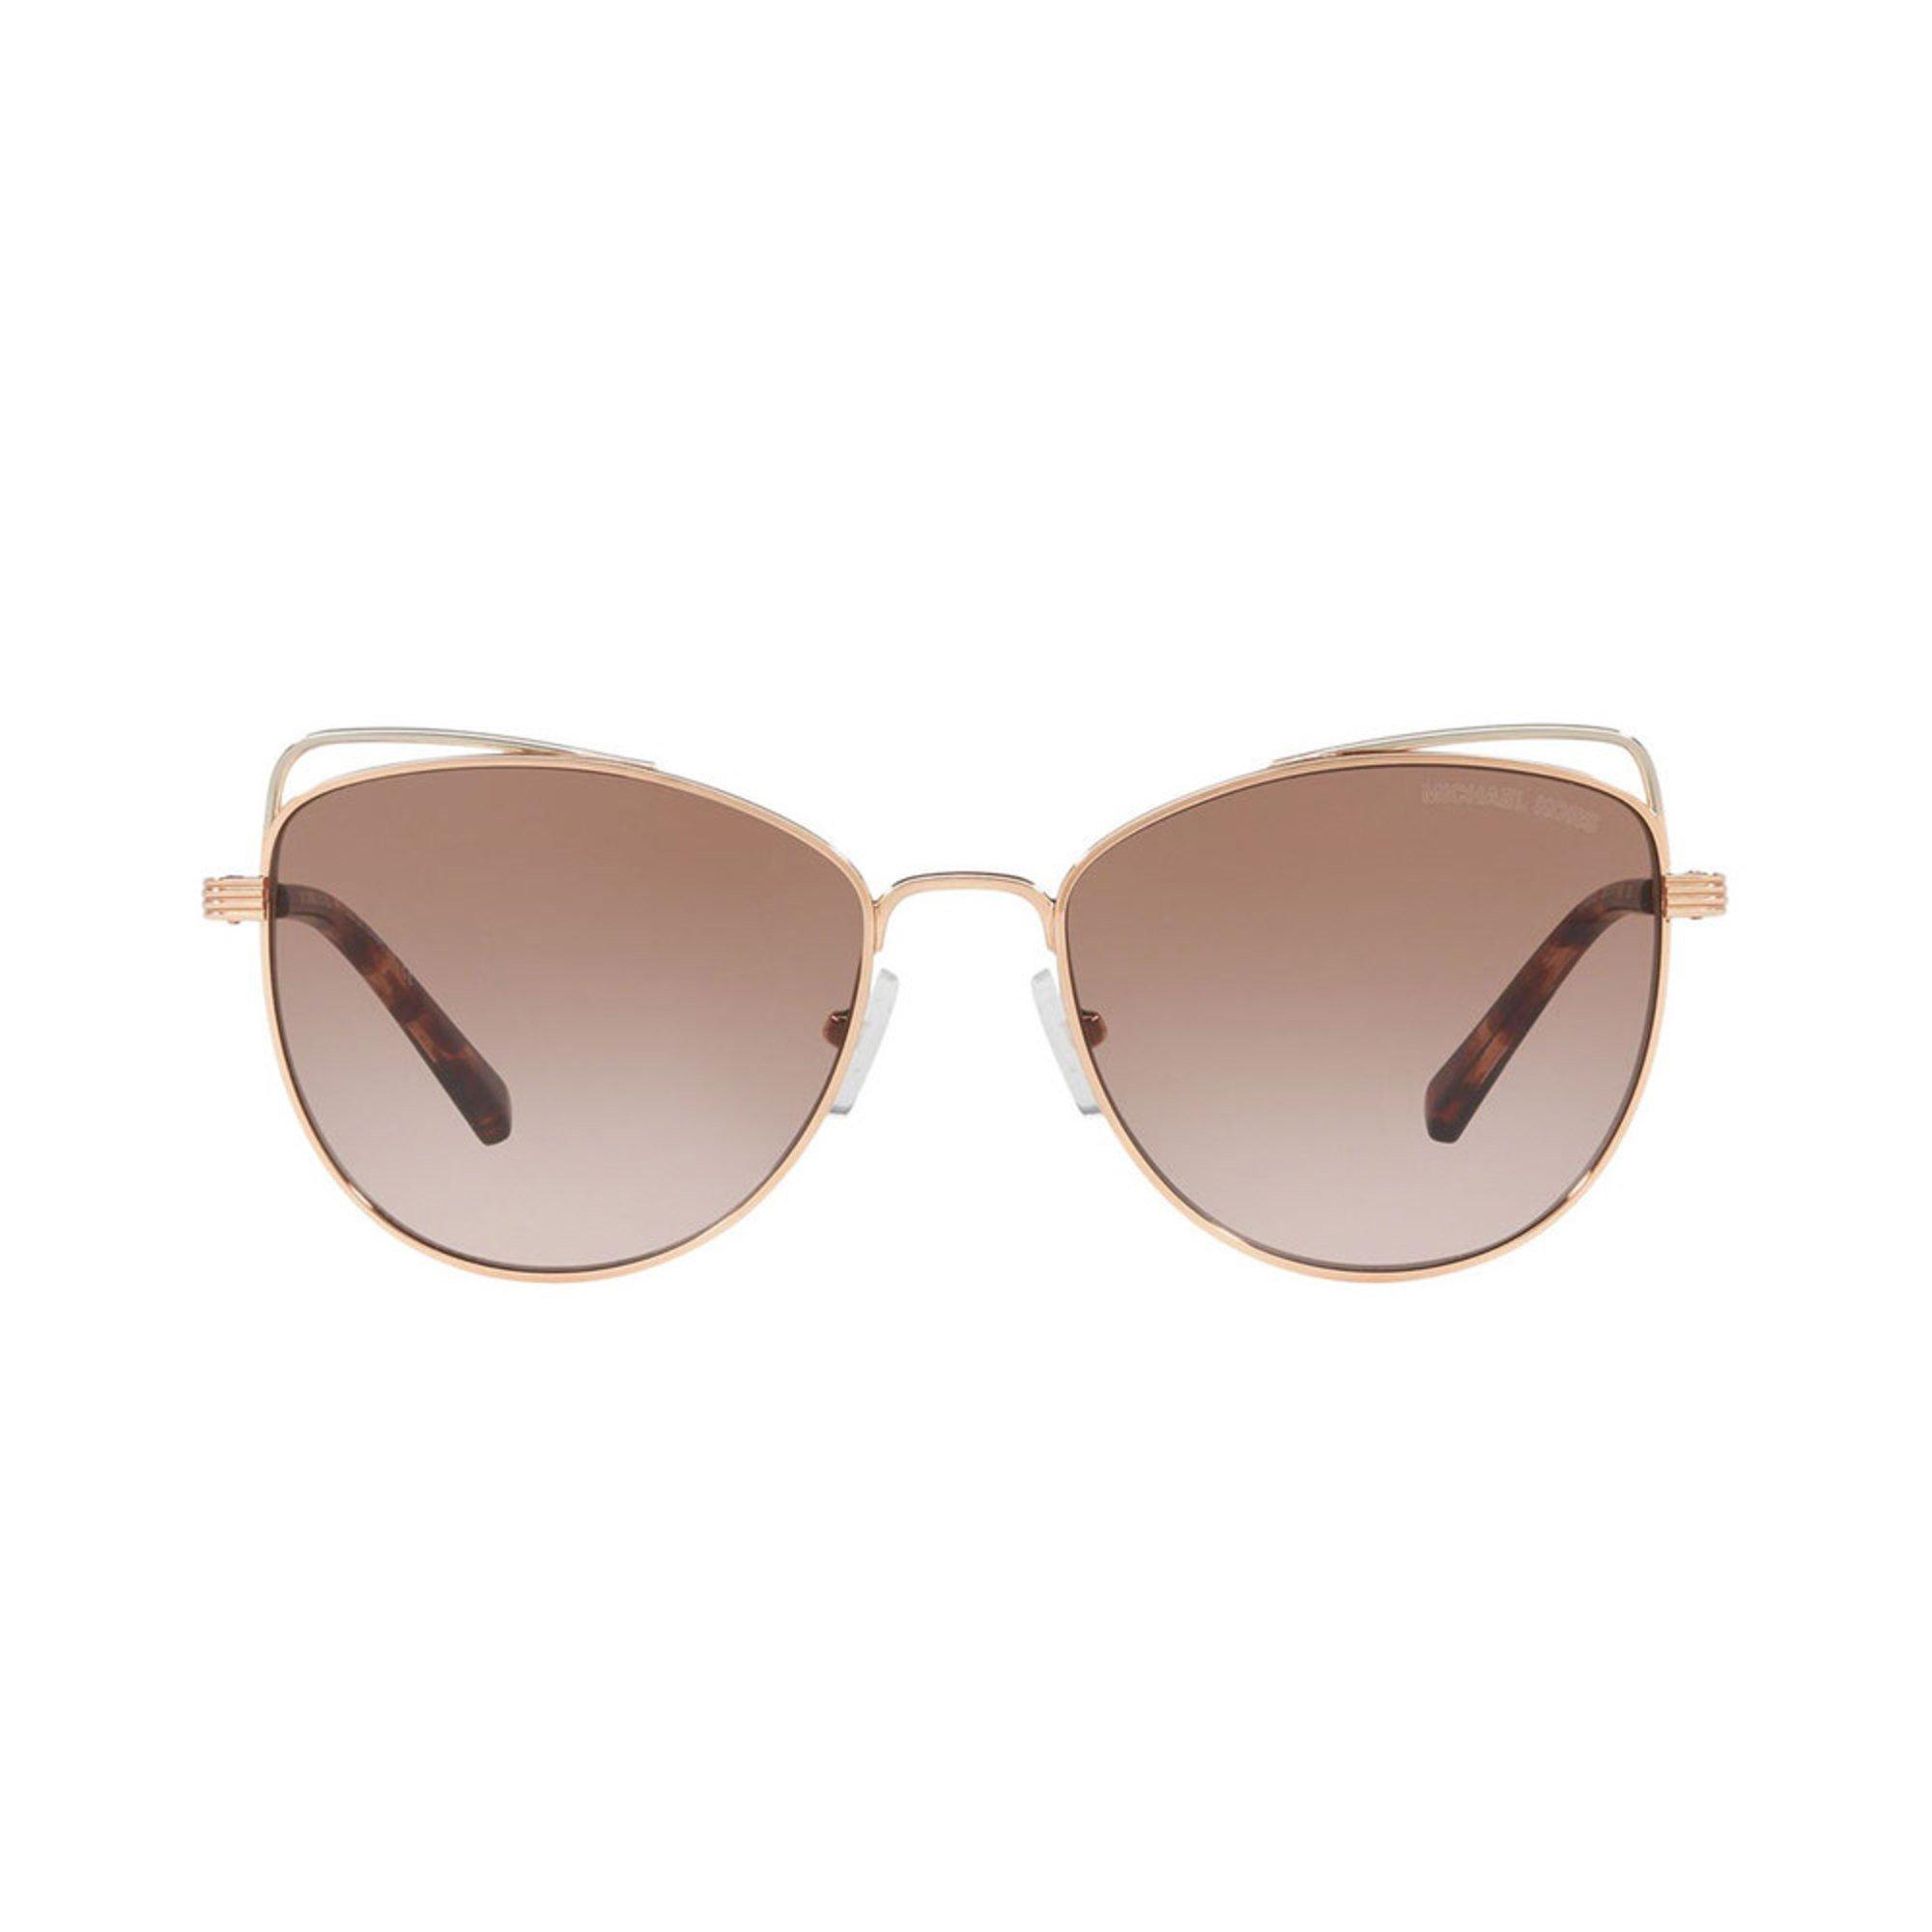 19519ceed9e Michael Kors. Michael Kors Women s St. Lucia Sunglasses